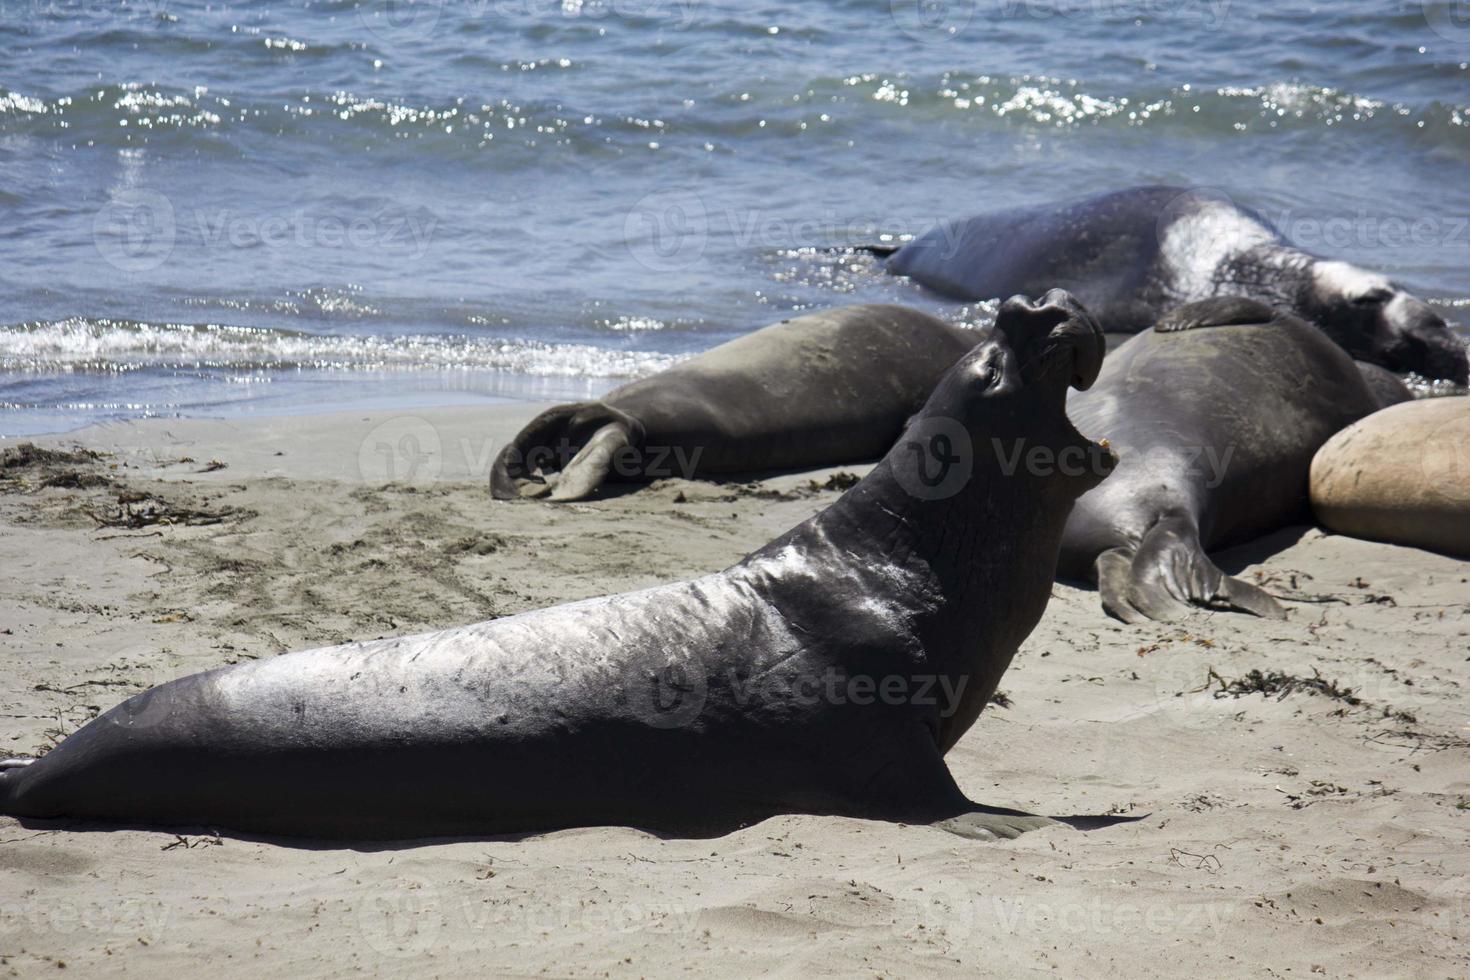 Sea Lions on the beach photo